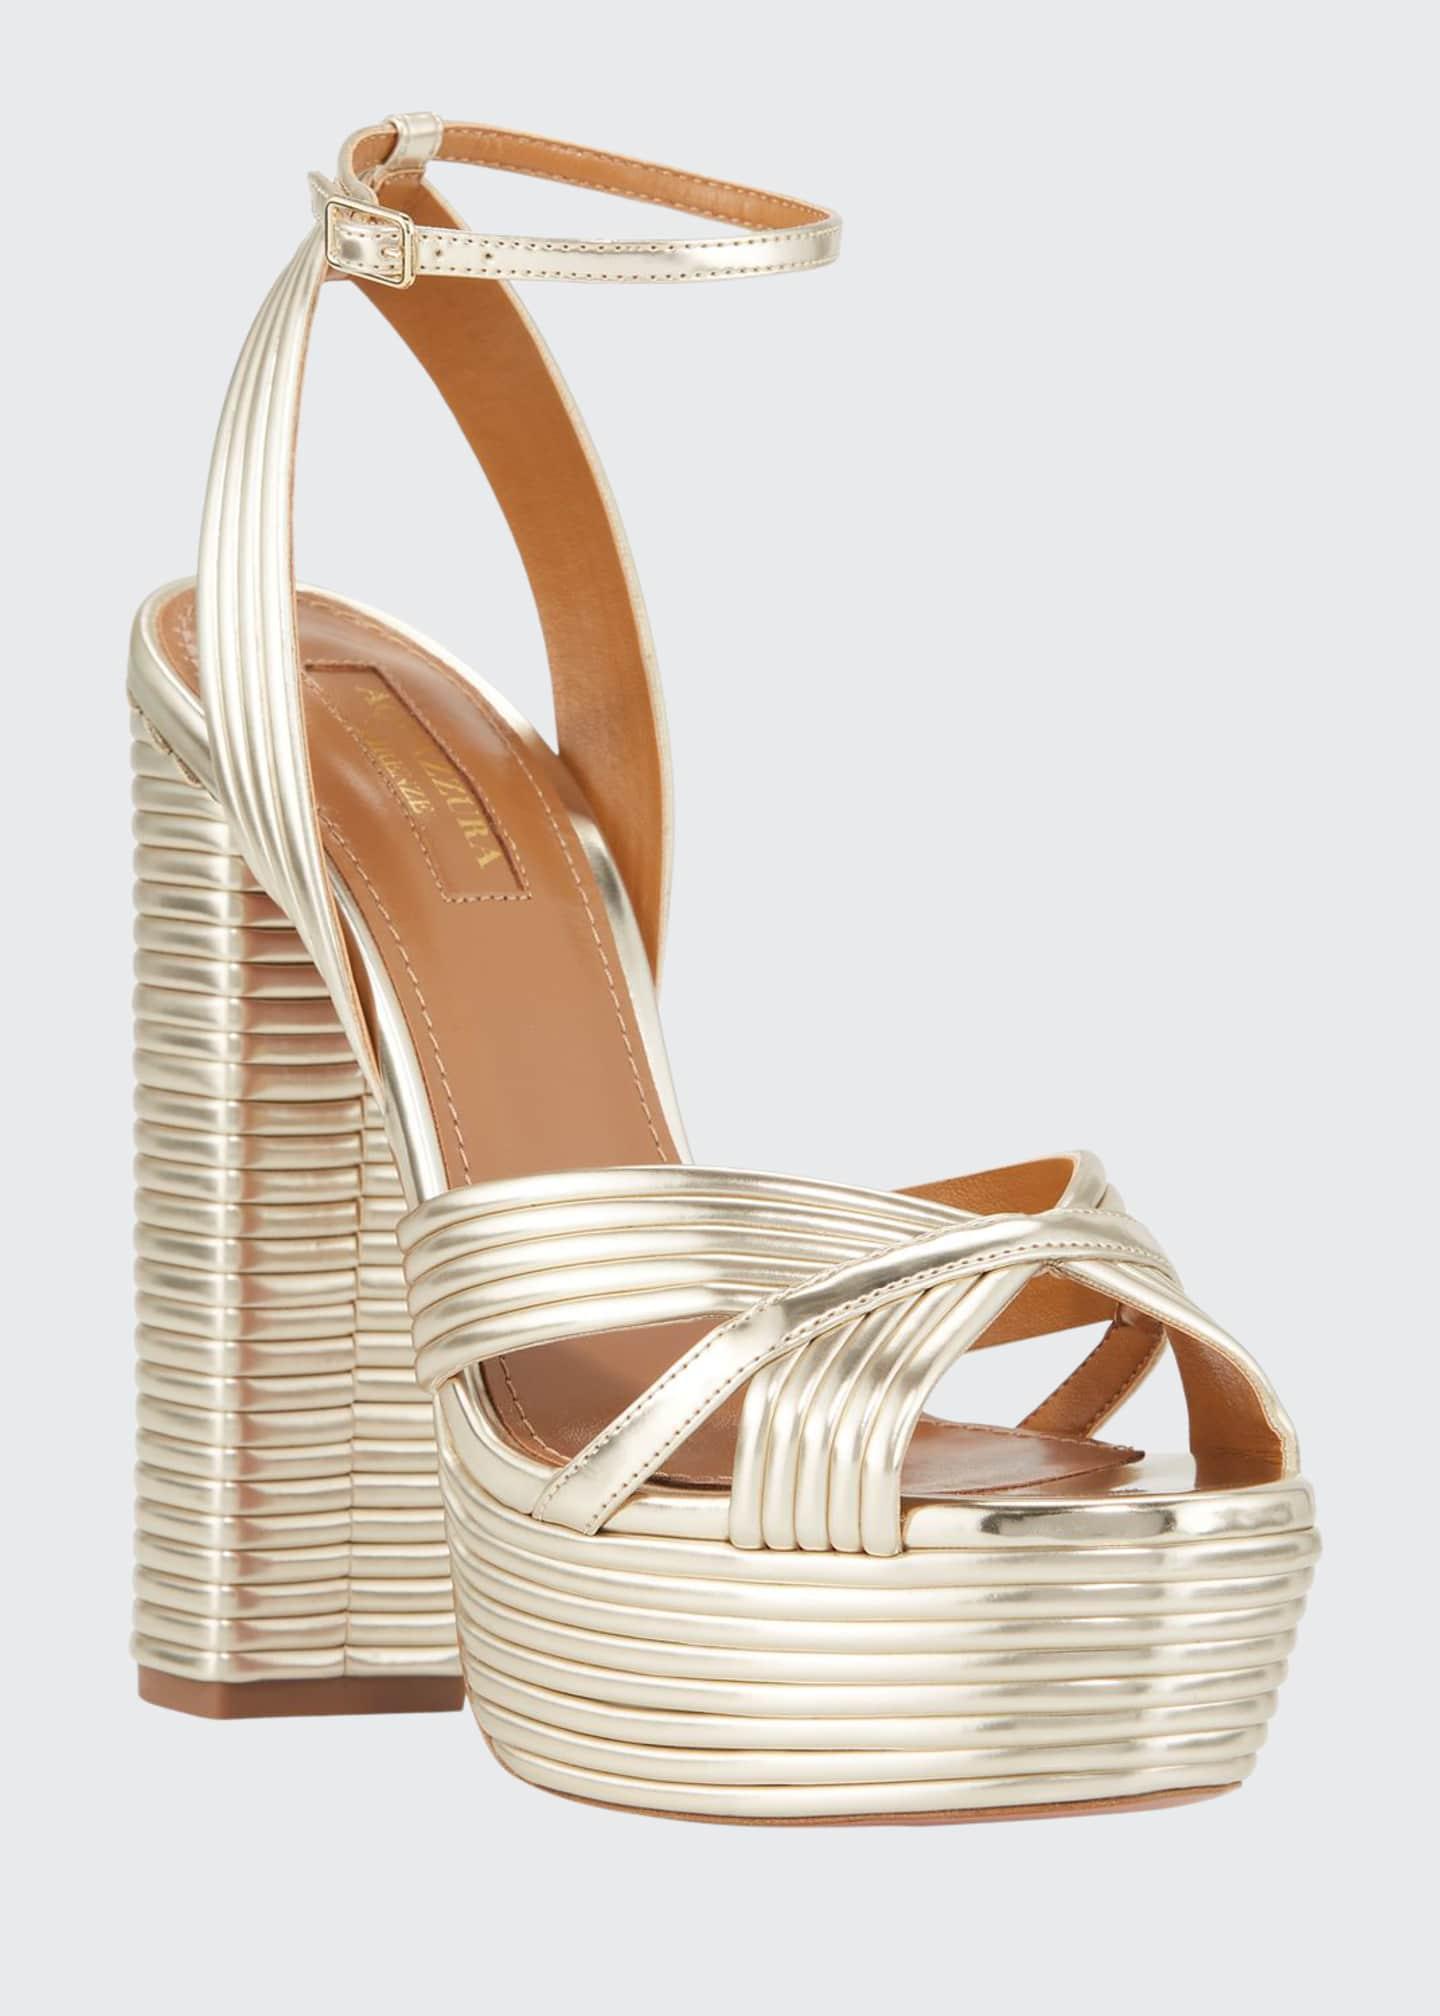 Aquazzura Sundance Plateau Metallic Platform Sandals